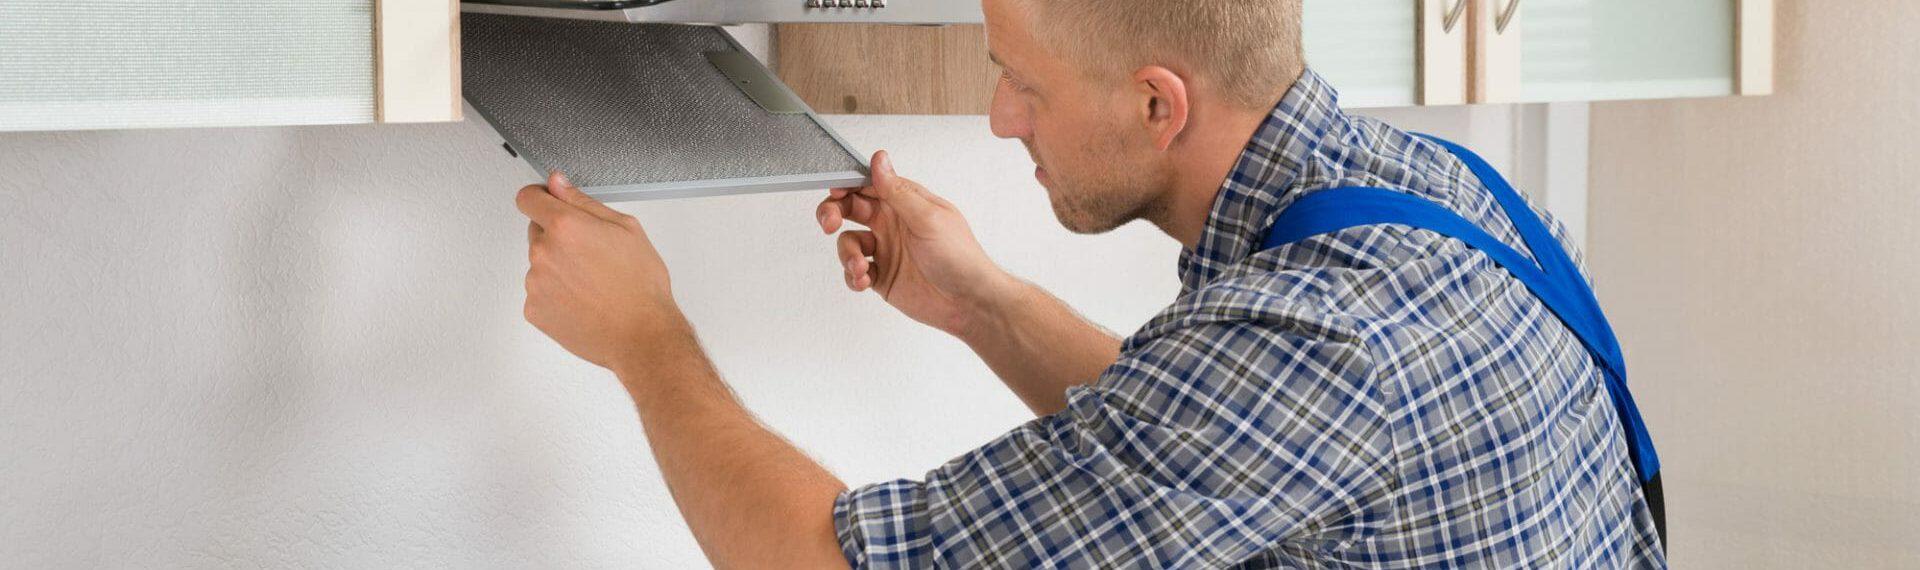 kitchen installer fitting cooker hood